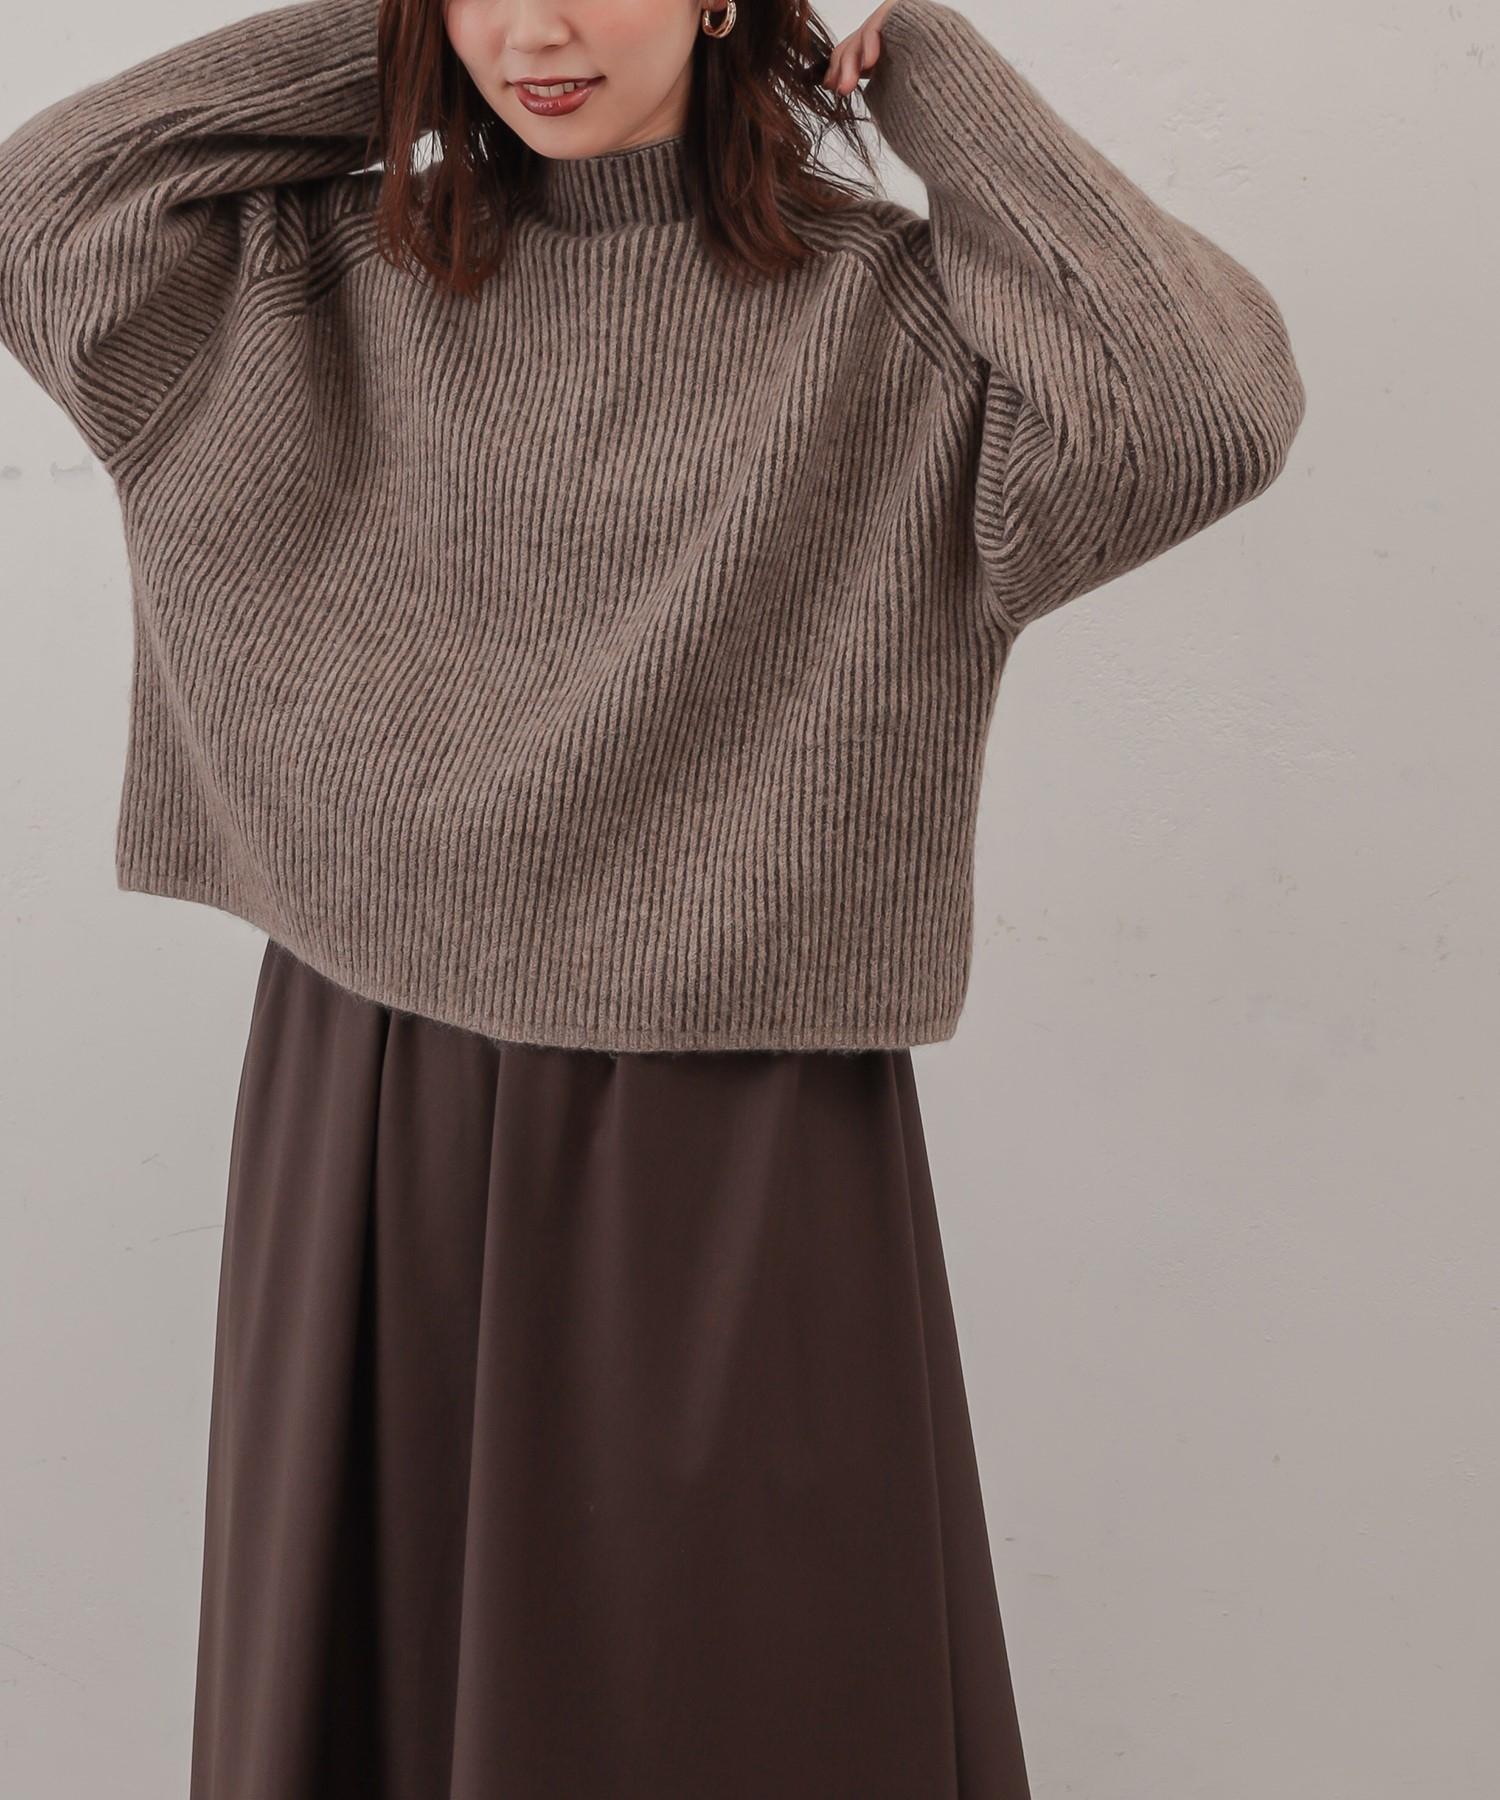 natural couture(ナチュラルクチュール) 【大人ナチュ】ボトルネックストライプニット